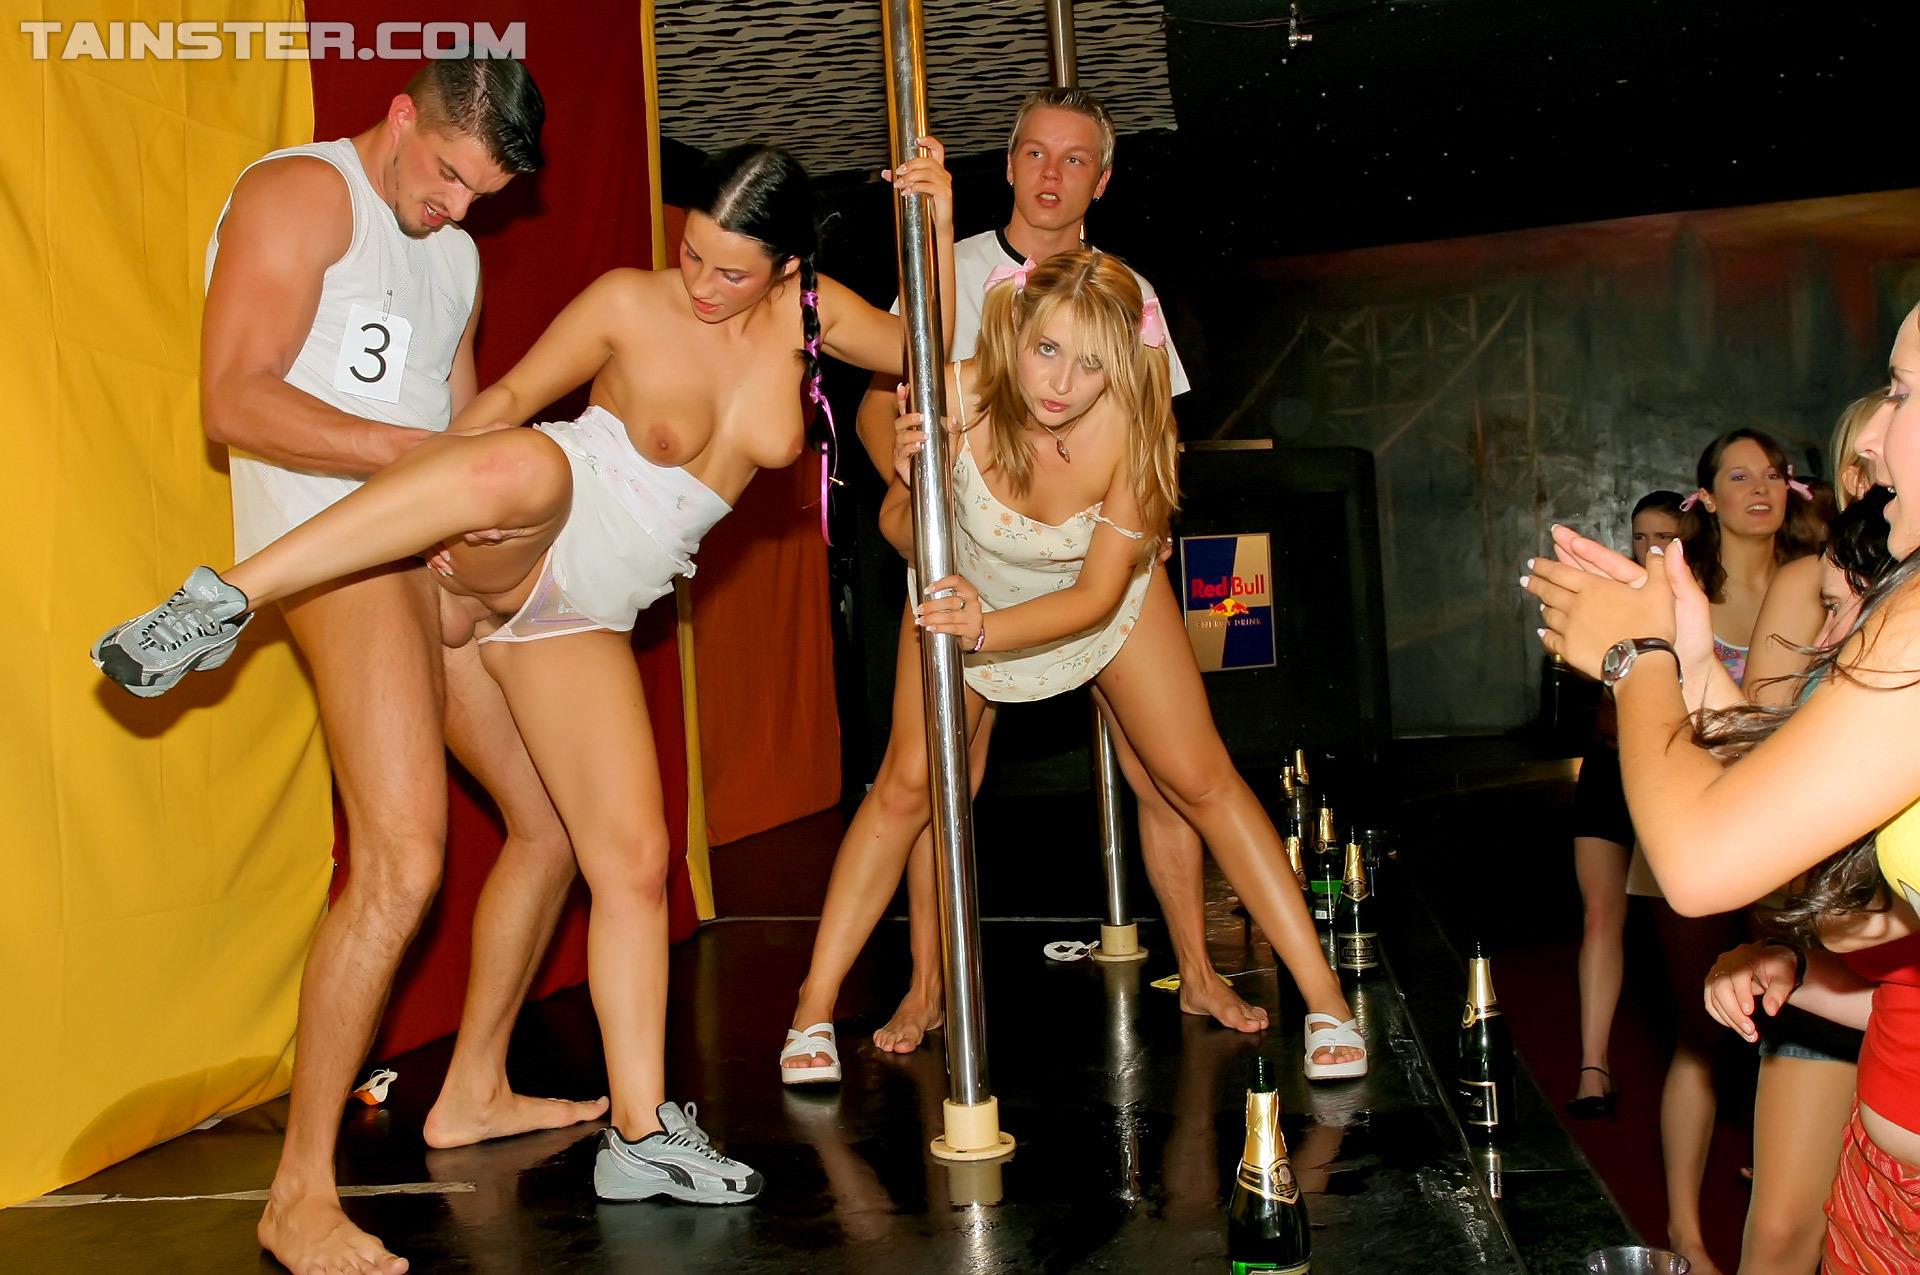 Anabel Porno anabel in swingingpornstars dso cockalicious contest part 3